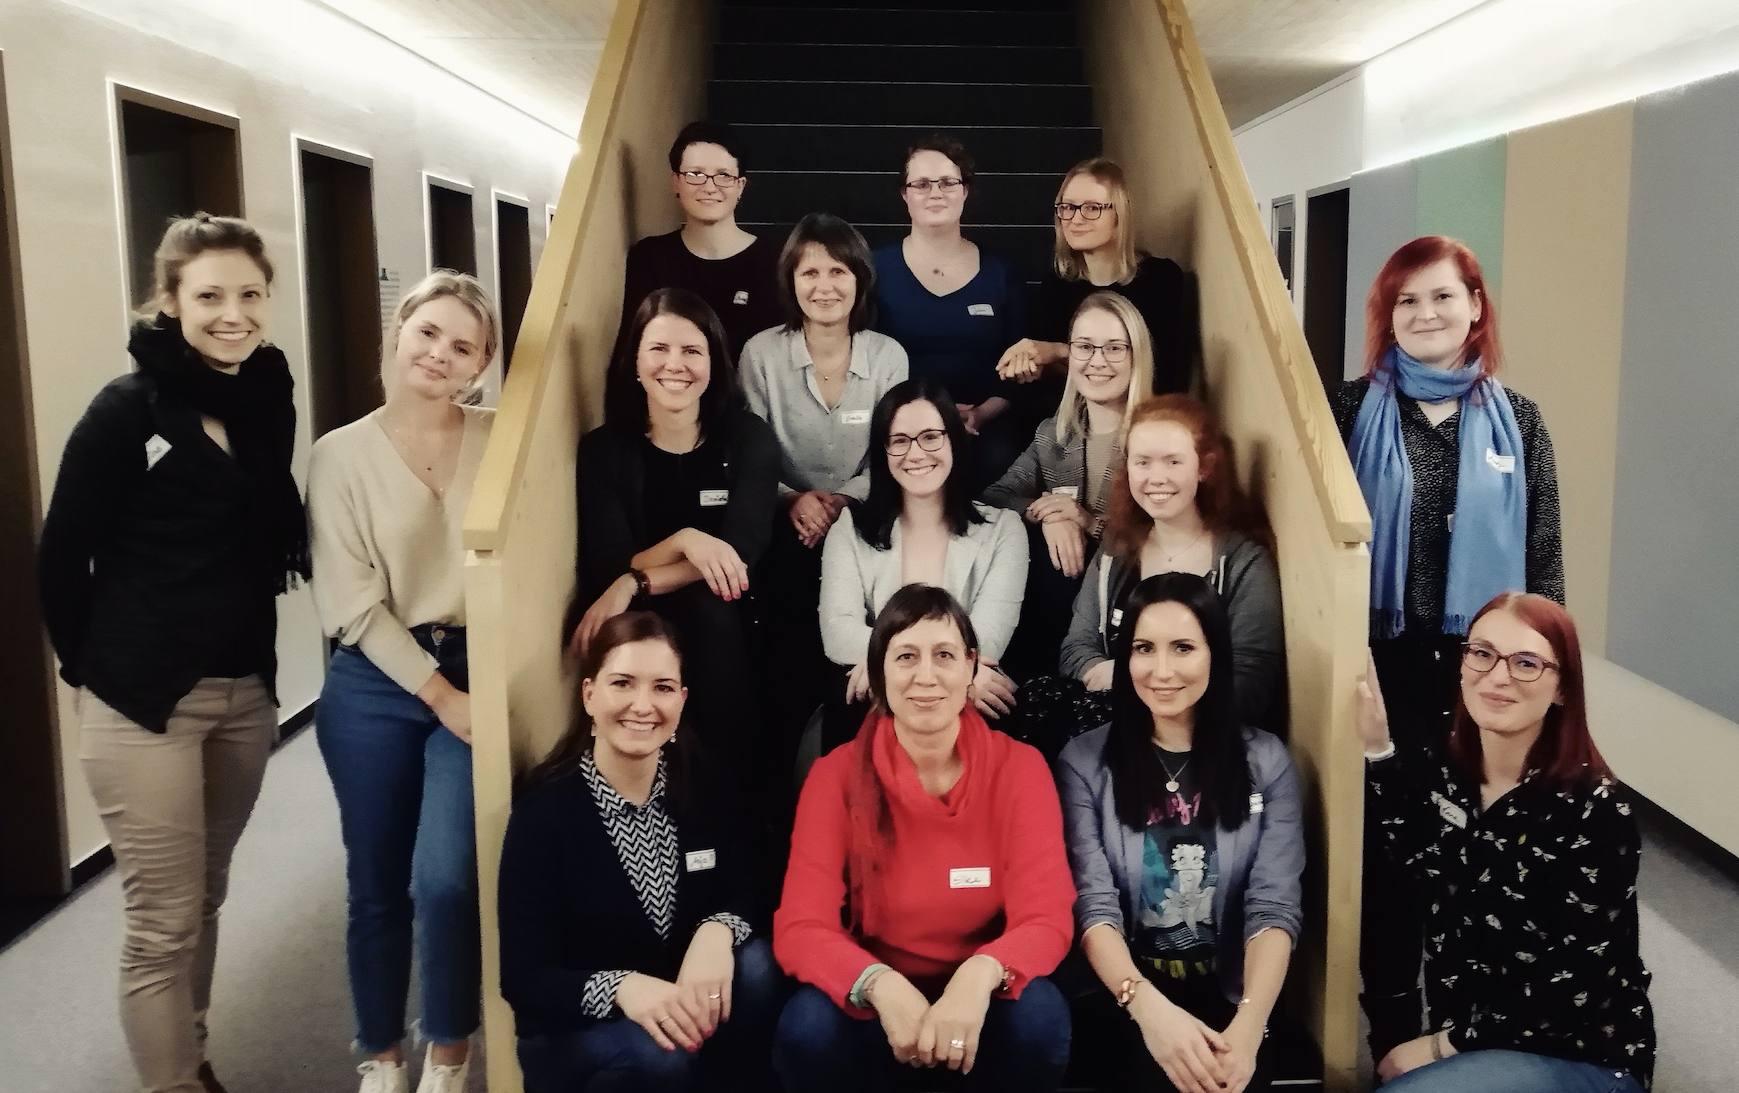 Frauenrunde des Female Leadership Meetup in Jena